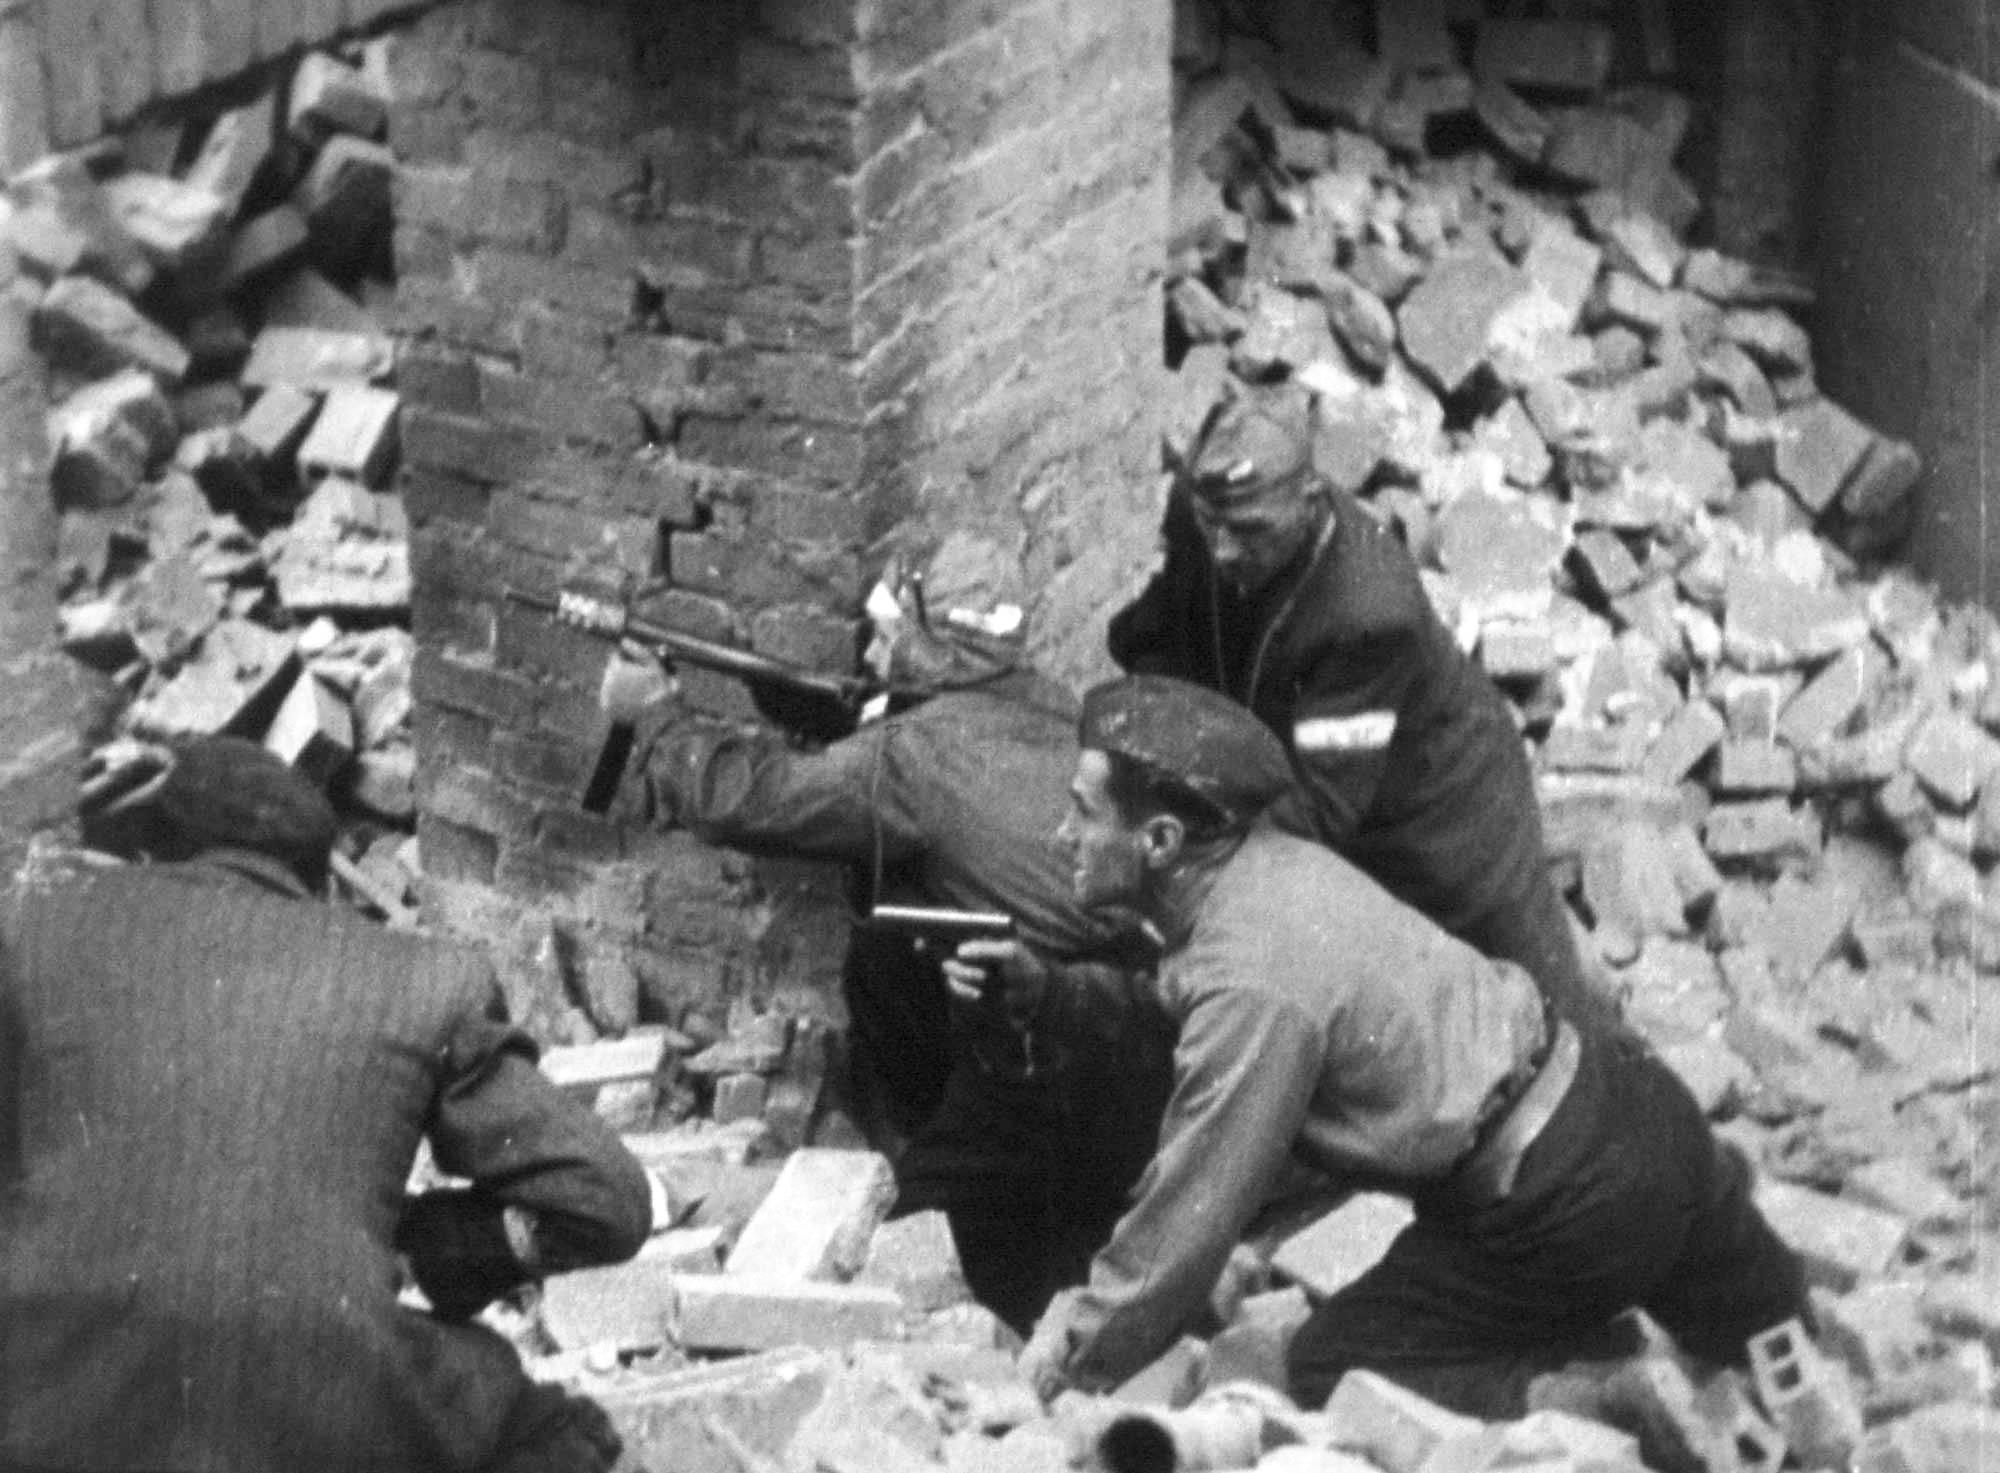 Warsaw_Uprising_Blyskawica